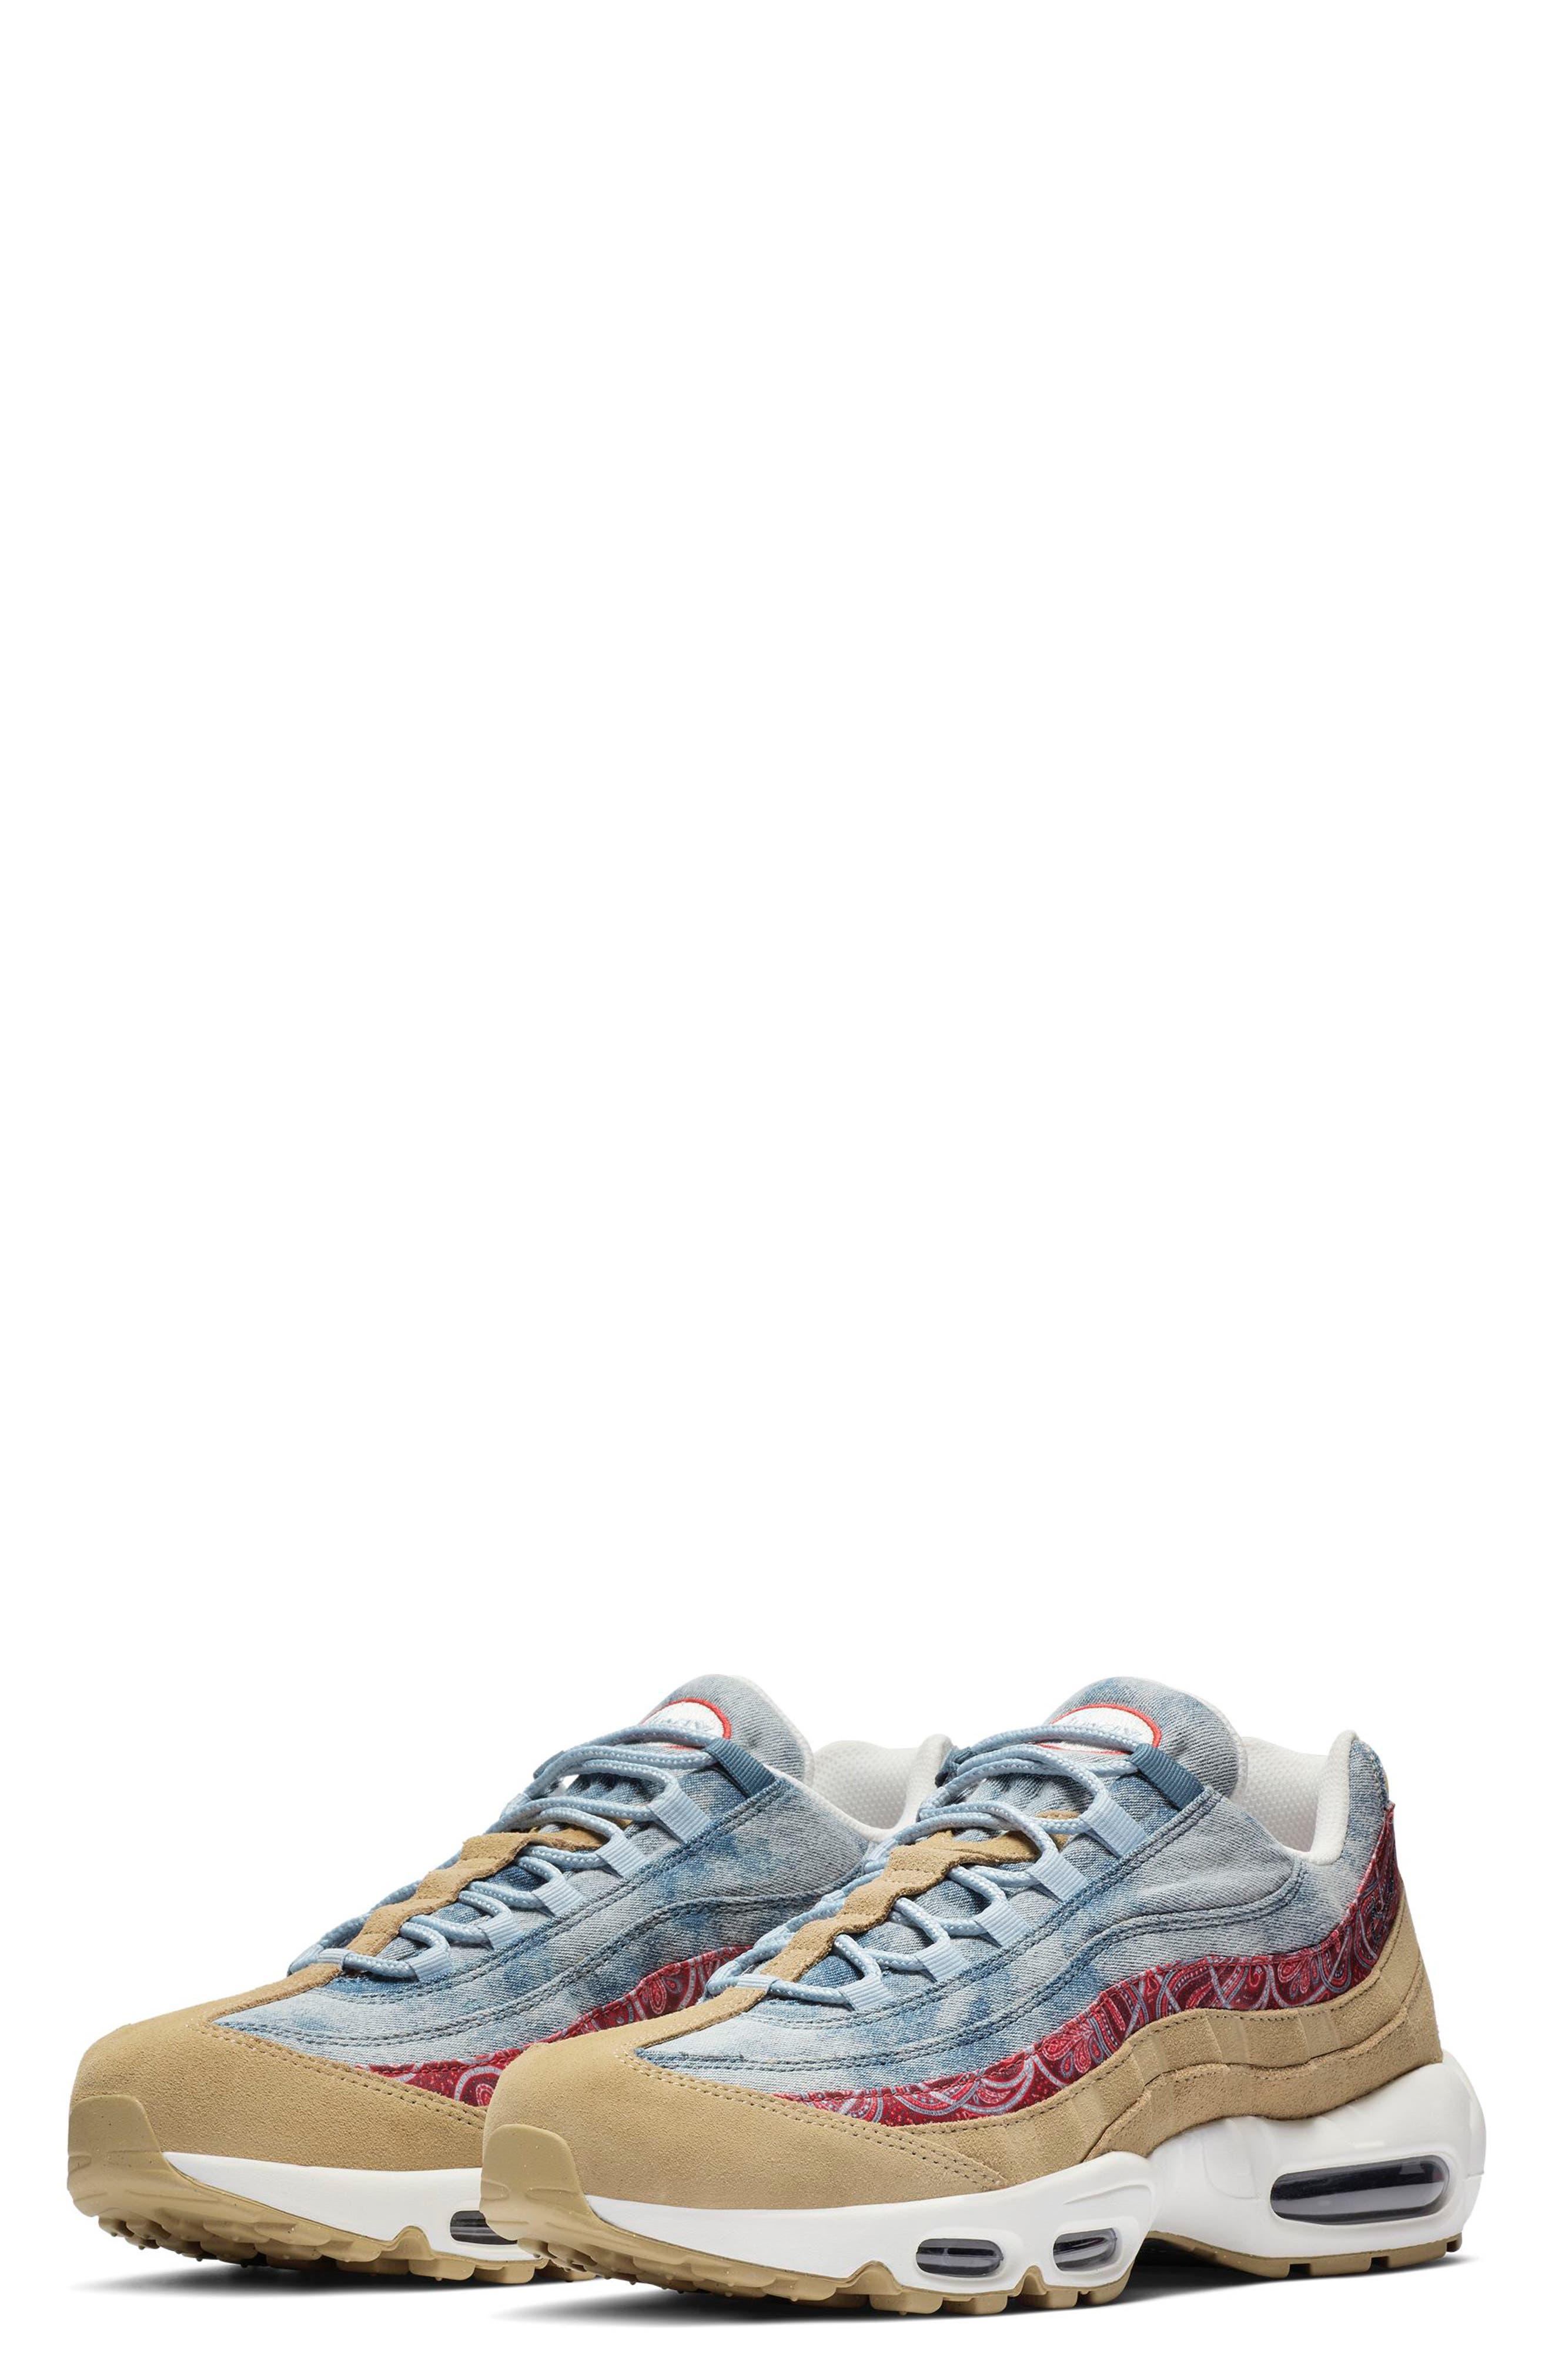 Air Max 95 Sneaker,                             Main thumbnail 1, color,                             PARACHUTE BEIGE/ RED